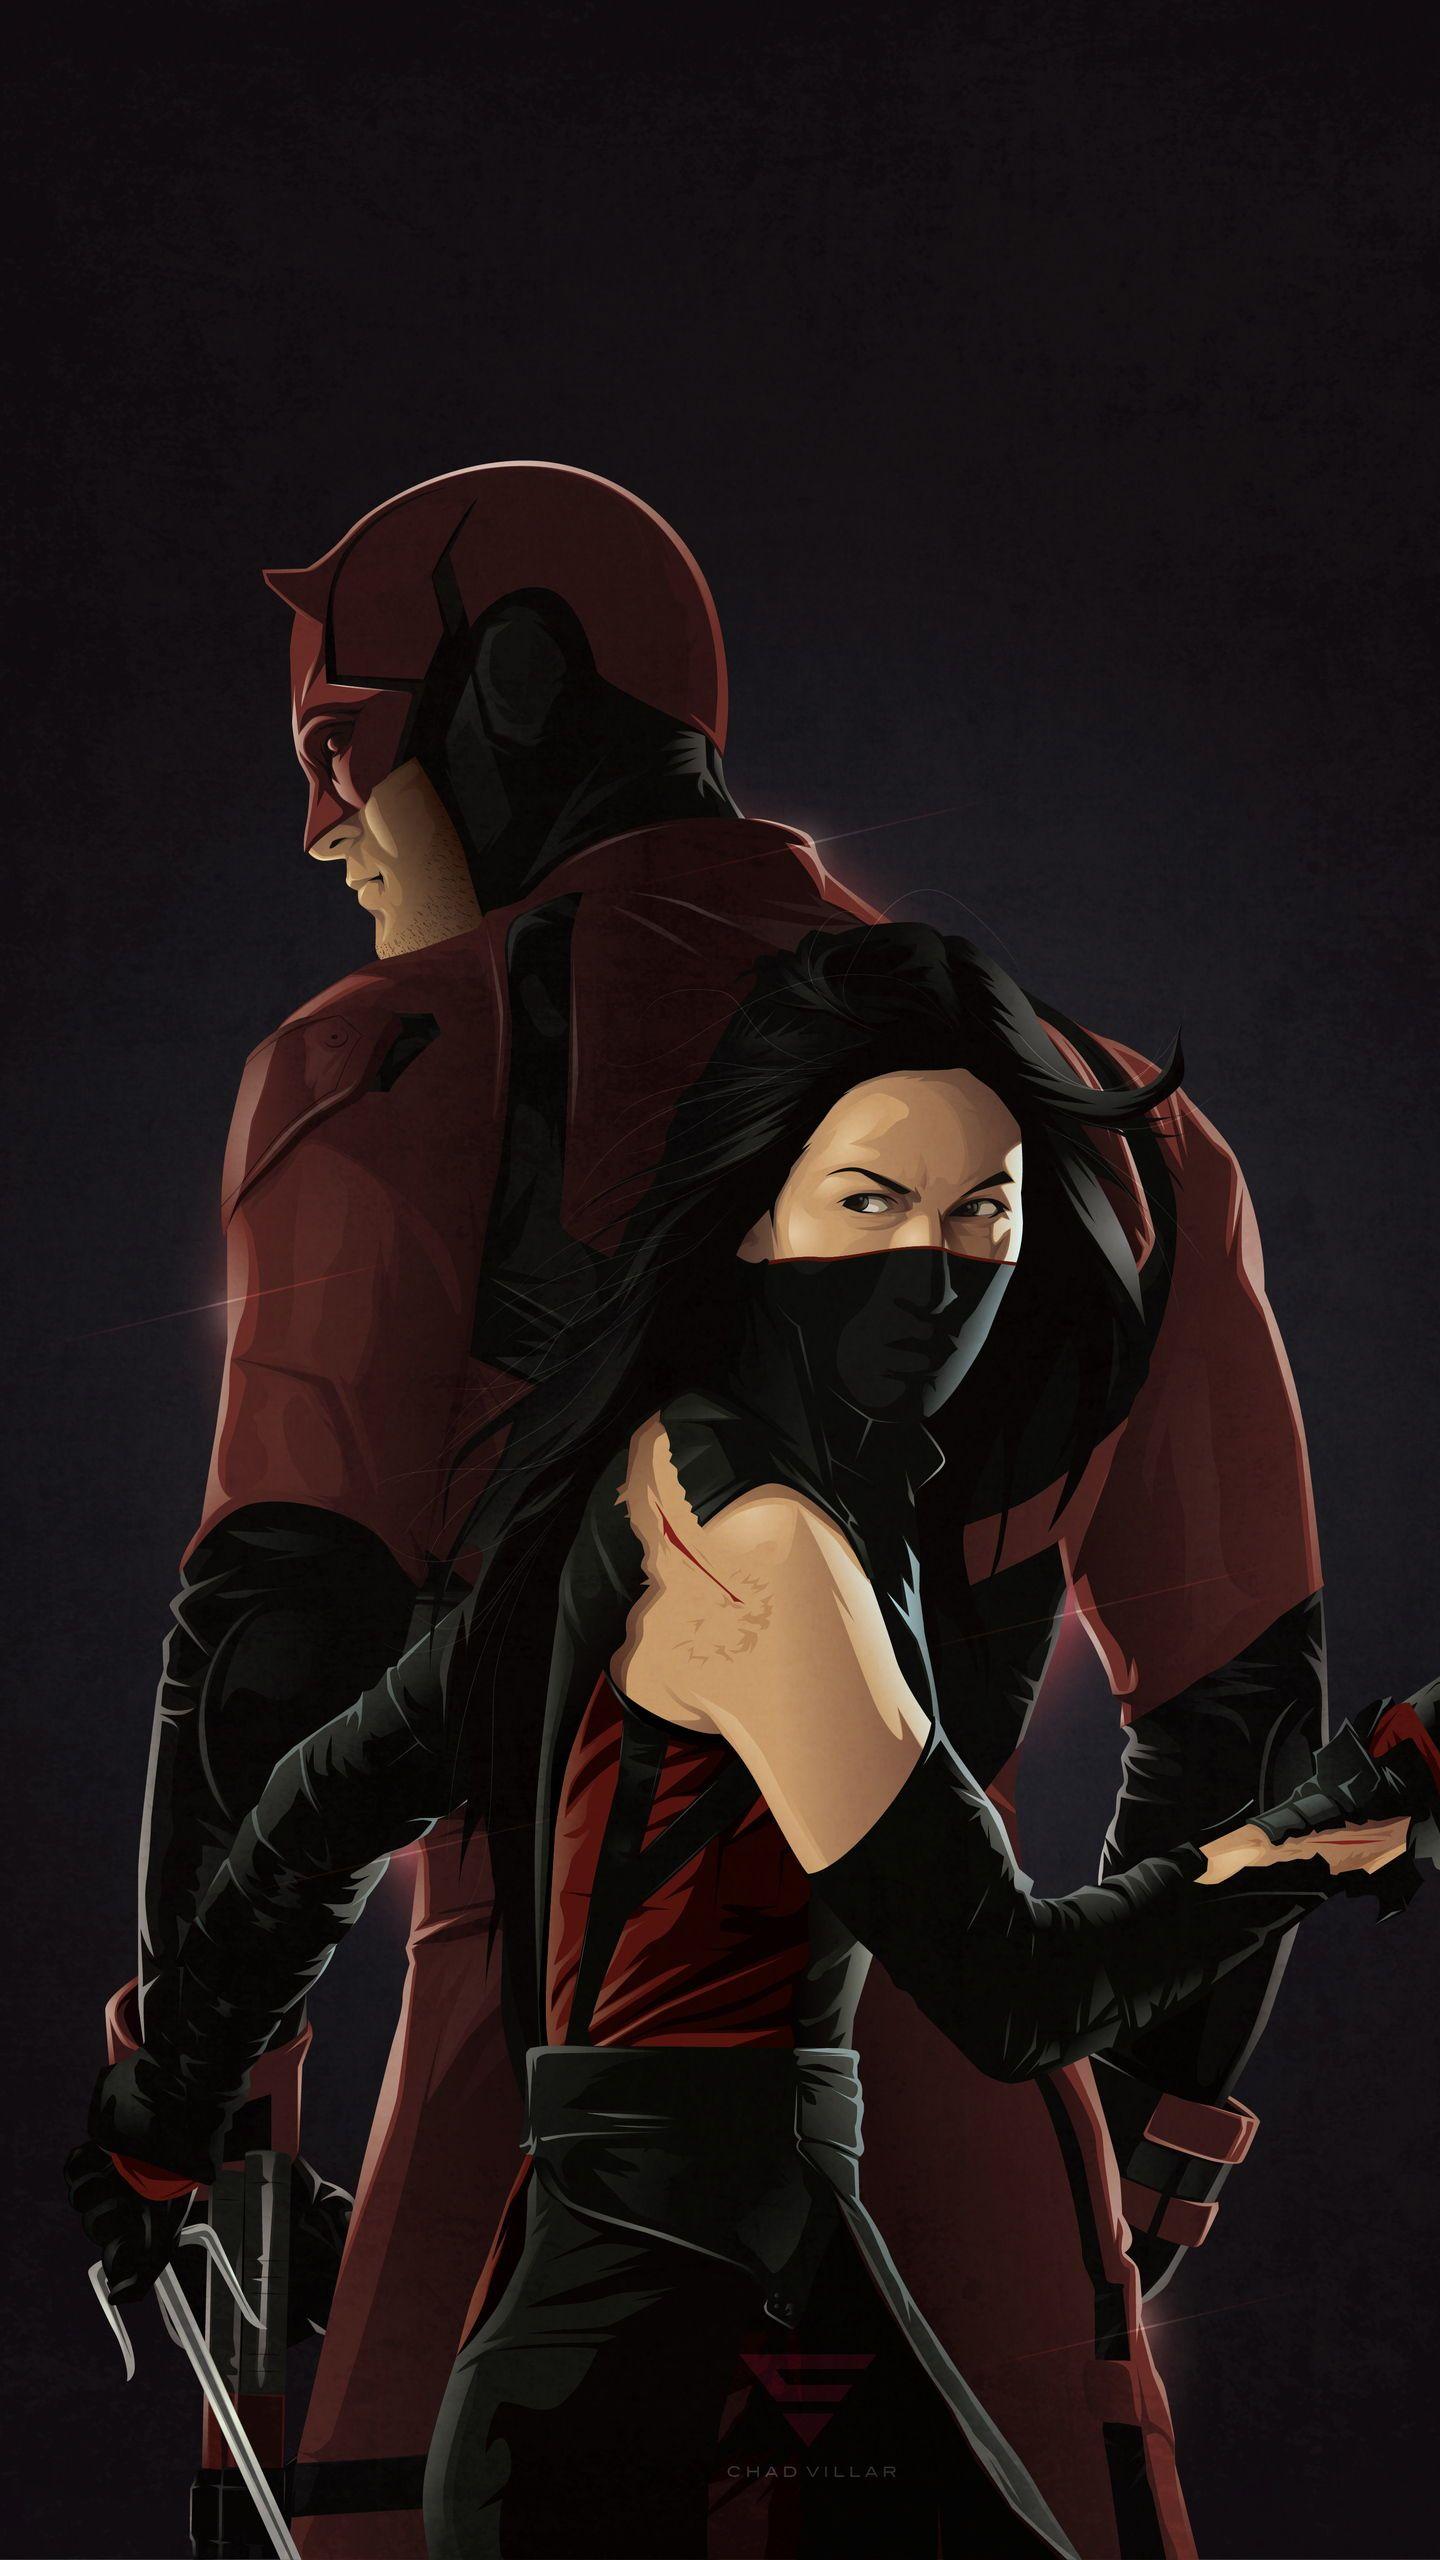 Daredevil Defenders Marvel Television wallpaper poster 1440x2560